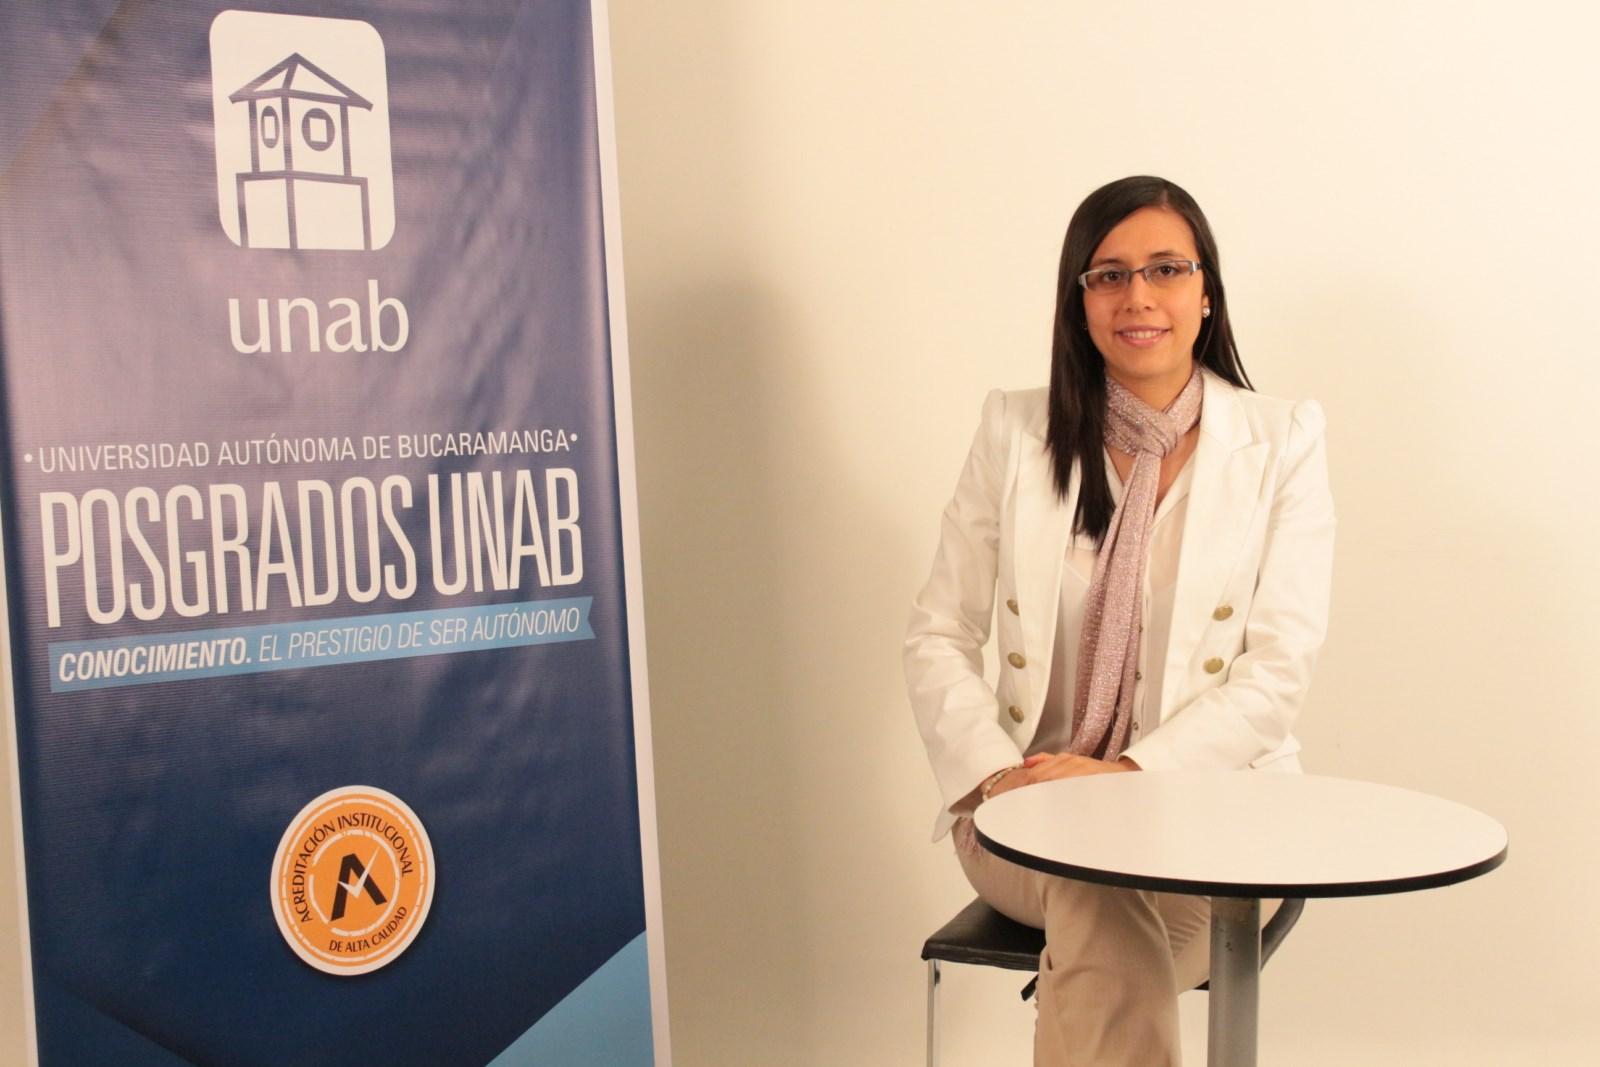 Nydia Marcela Reyes Maldonado